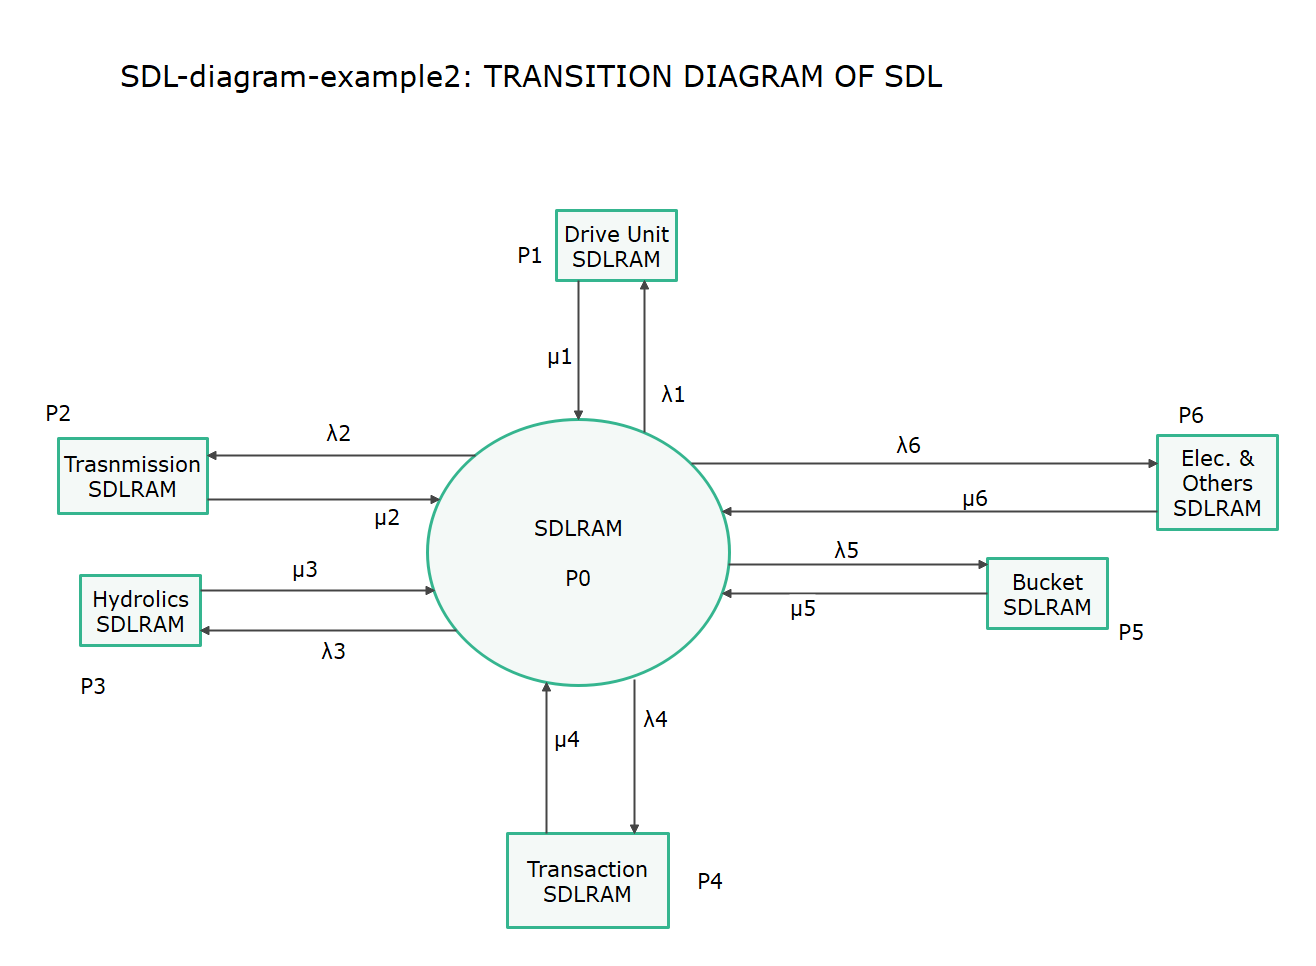 Transition Diagram of SDL